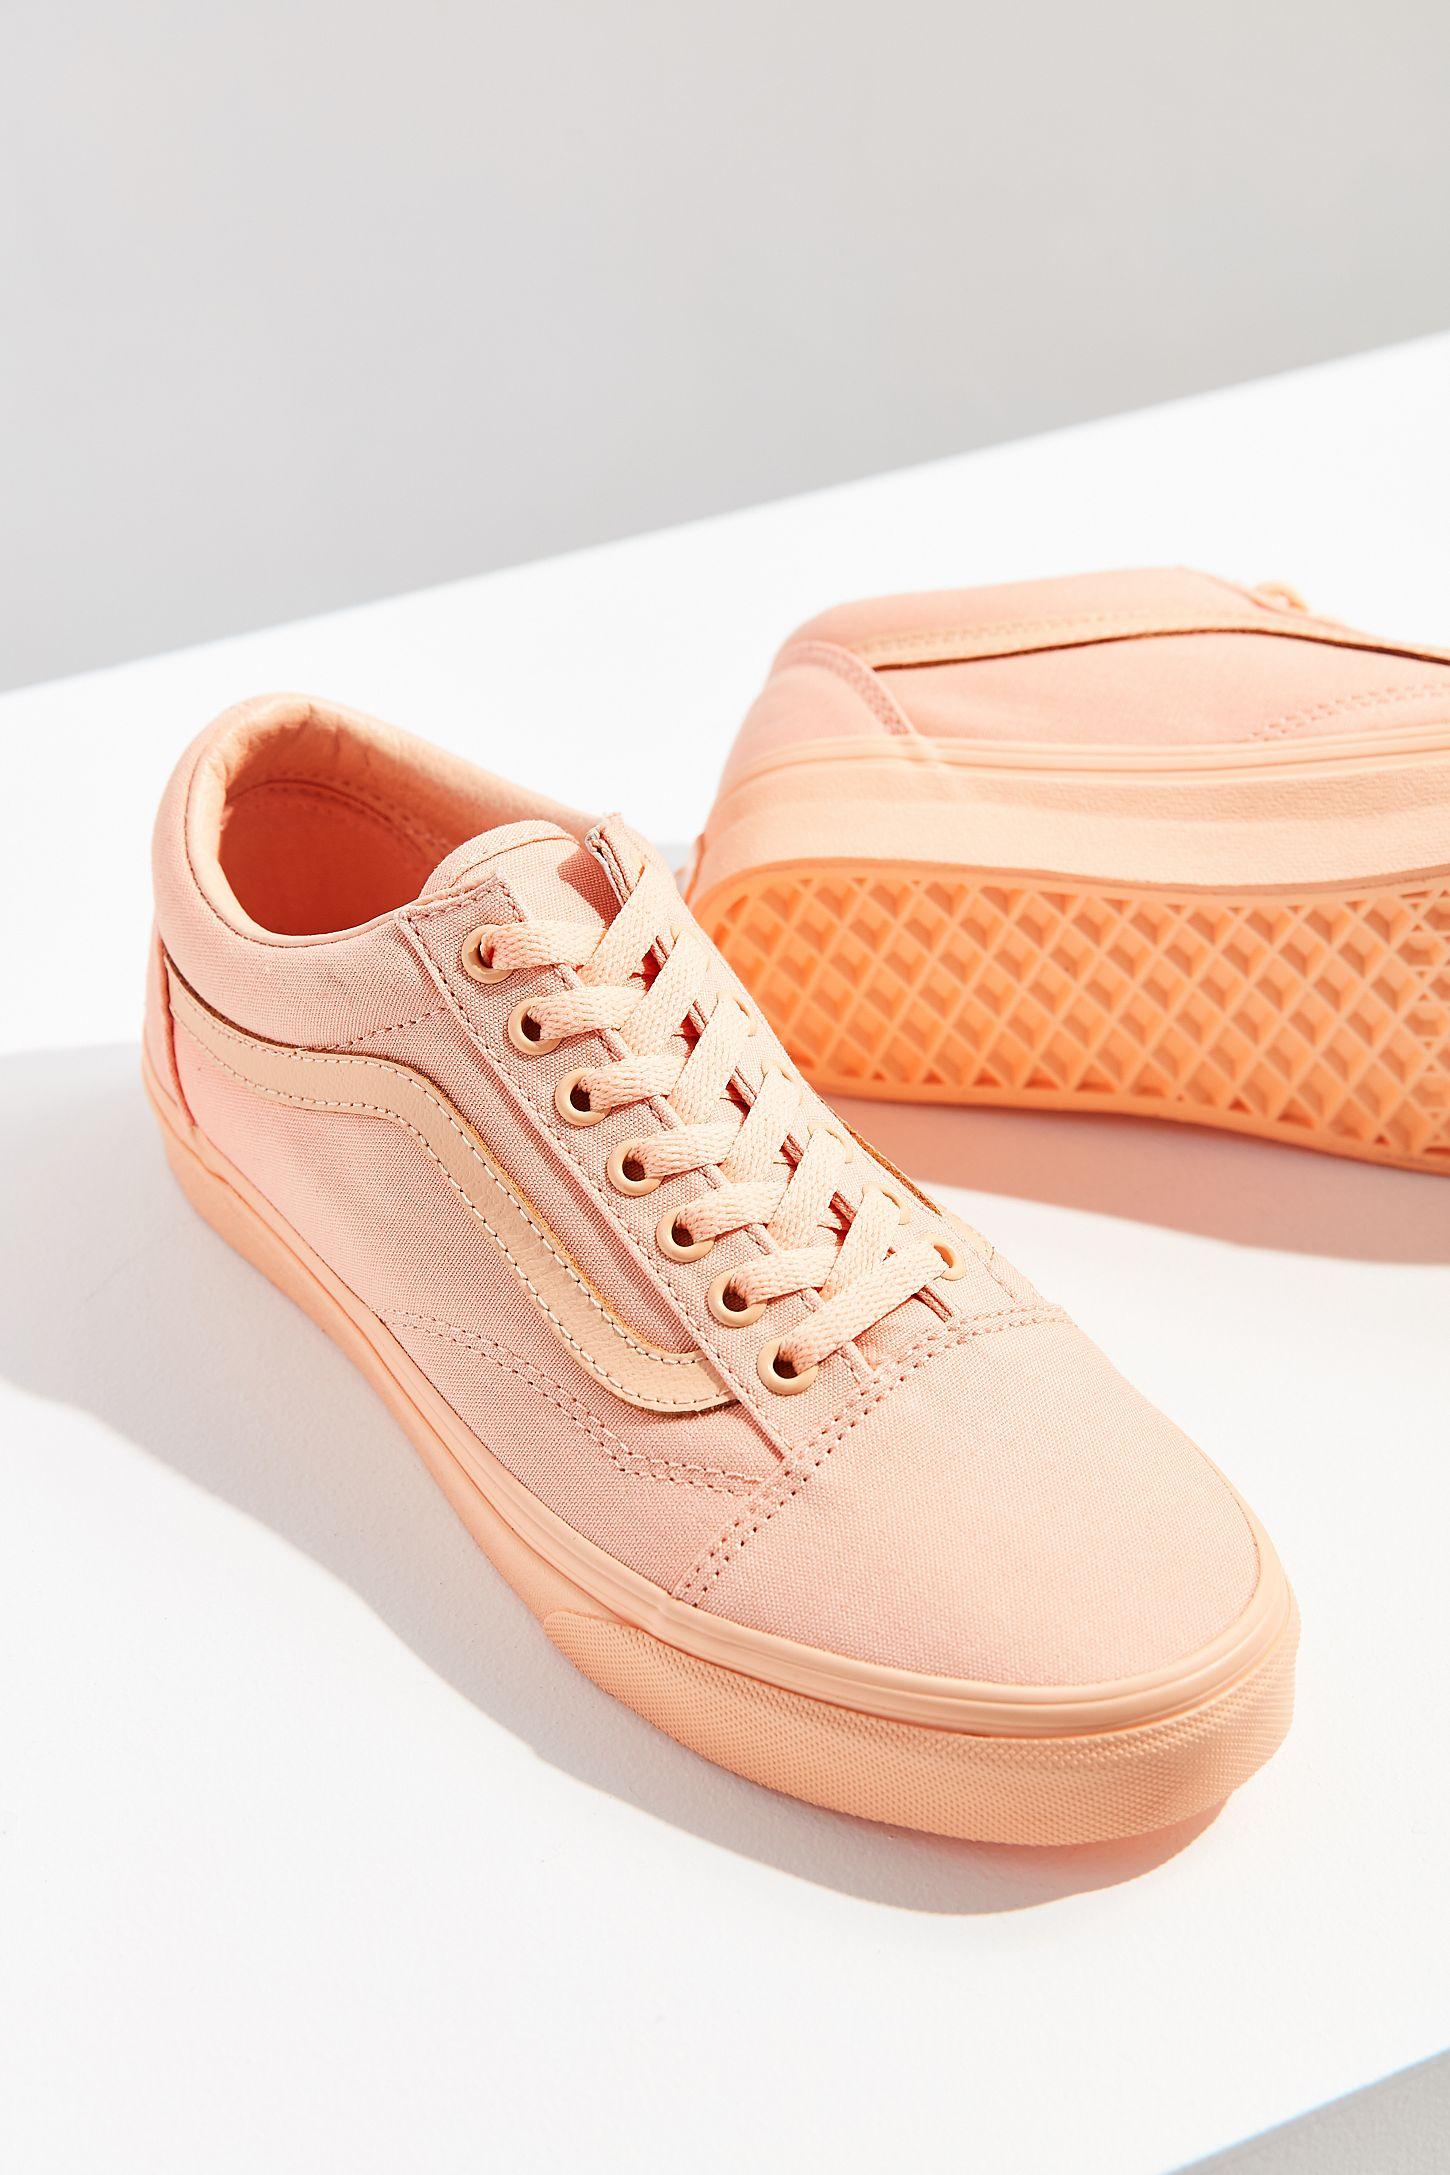 bf3dd996d20c16 Vans Mono Canvas Old Skool Sneaker